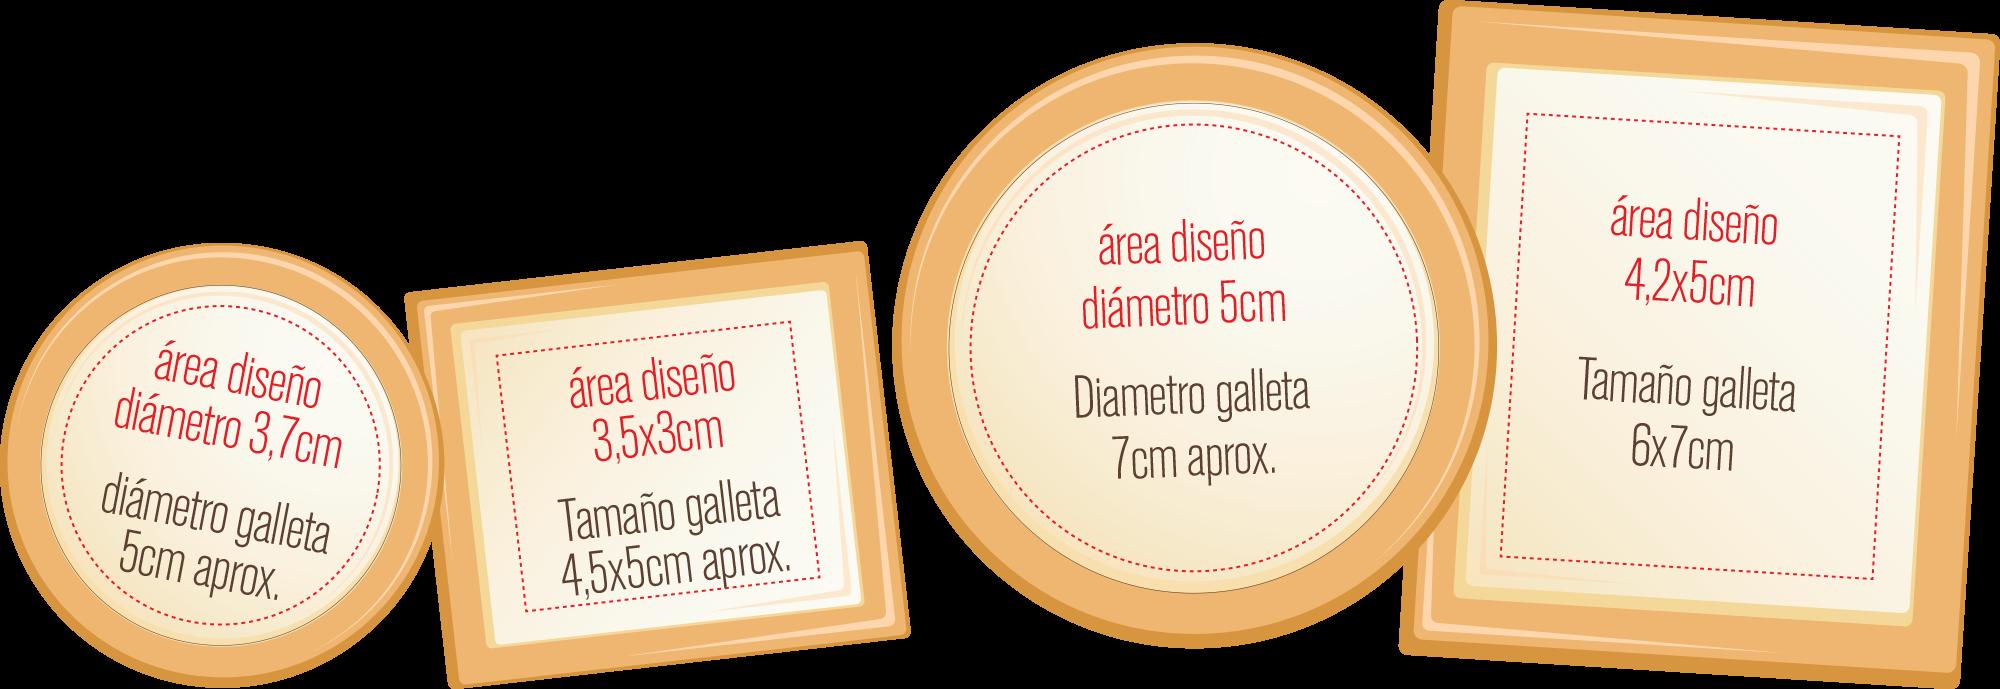 portafolio-cookies-diseno-cookies-place